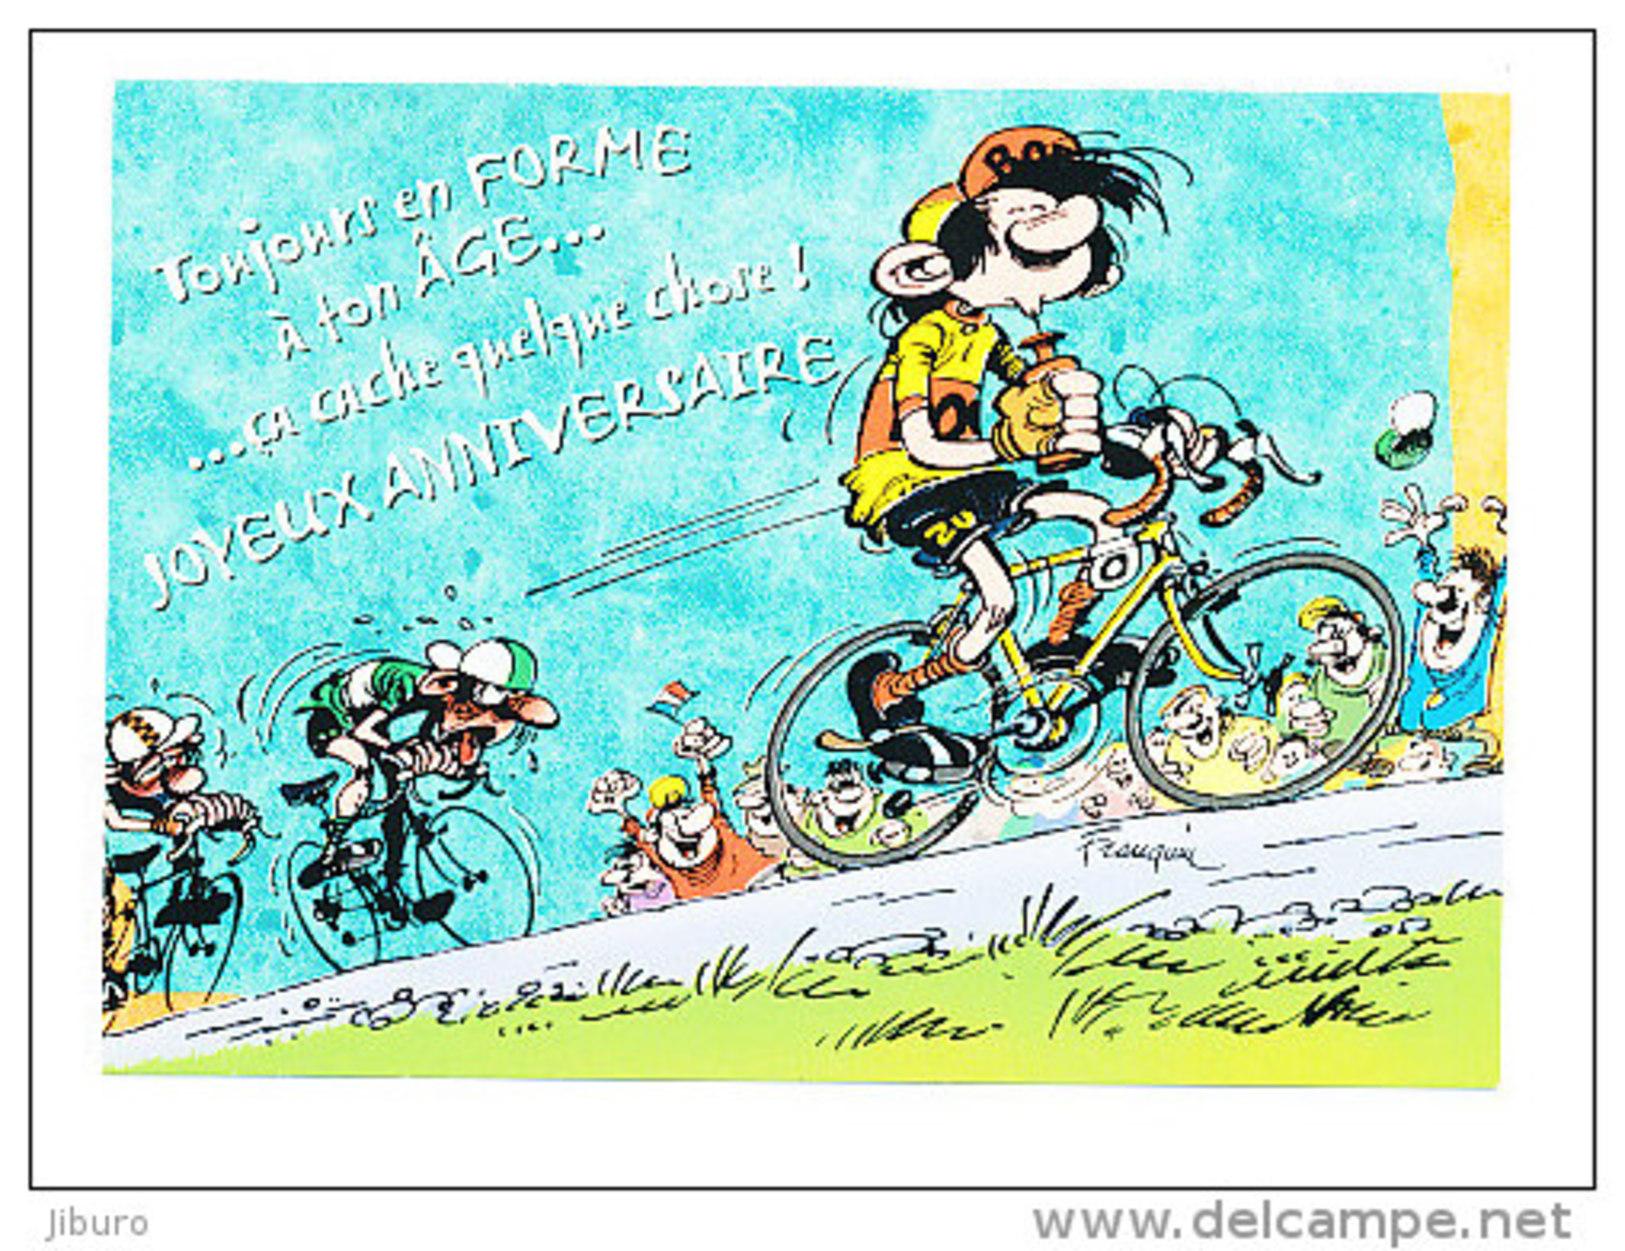 Bandes Dessinees Gaston Lagaffe Joyeux Anniversaire Humour Velo Cyclisme Course Cycliste Bicyclette Bicycle Humor Sport Cp 8 695